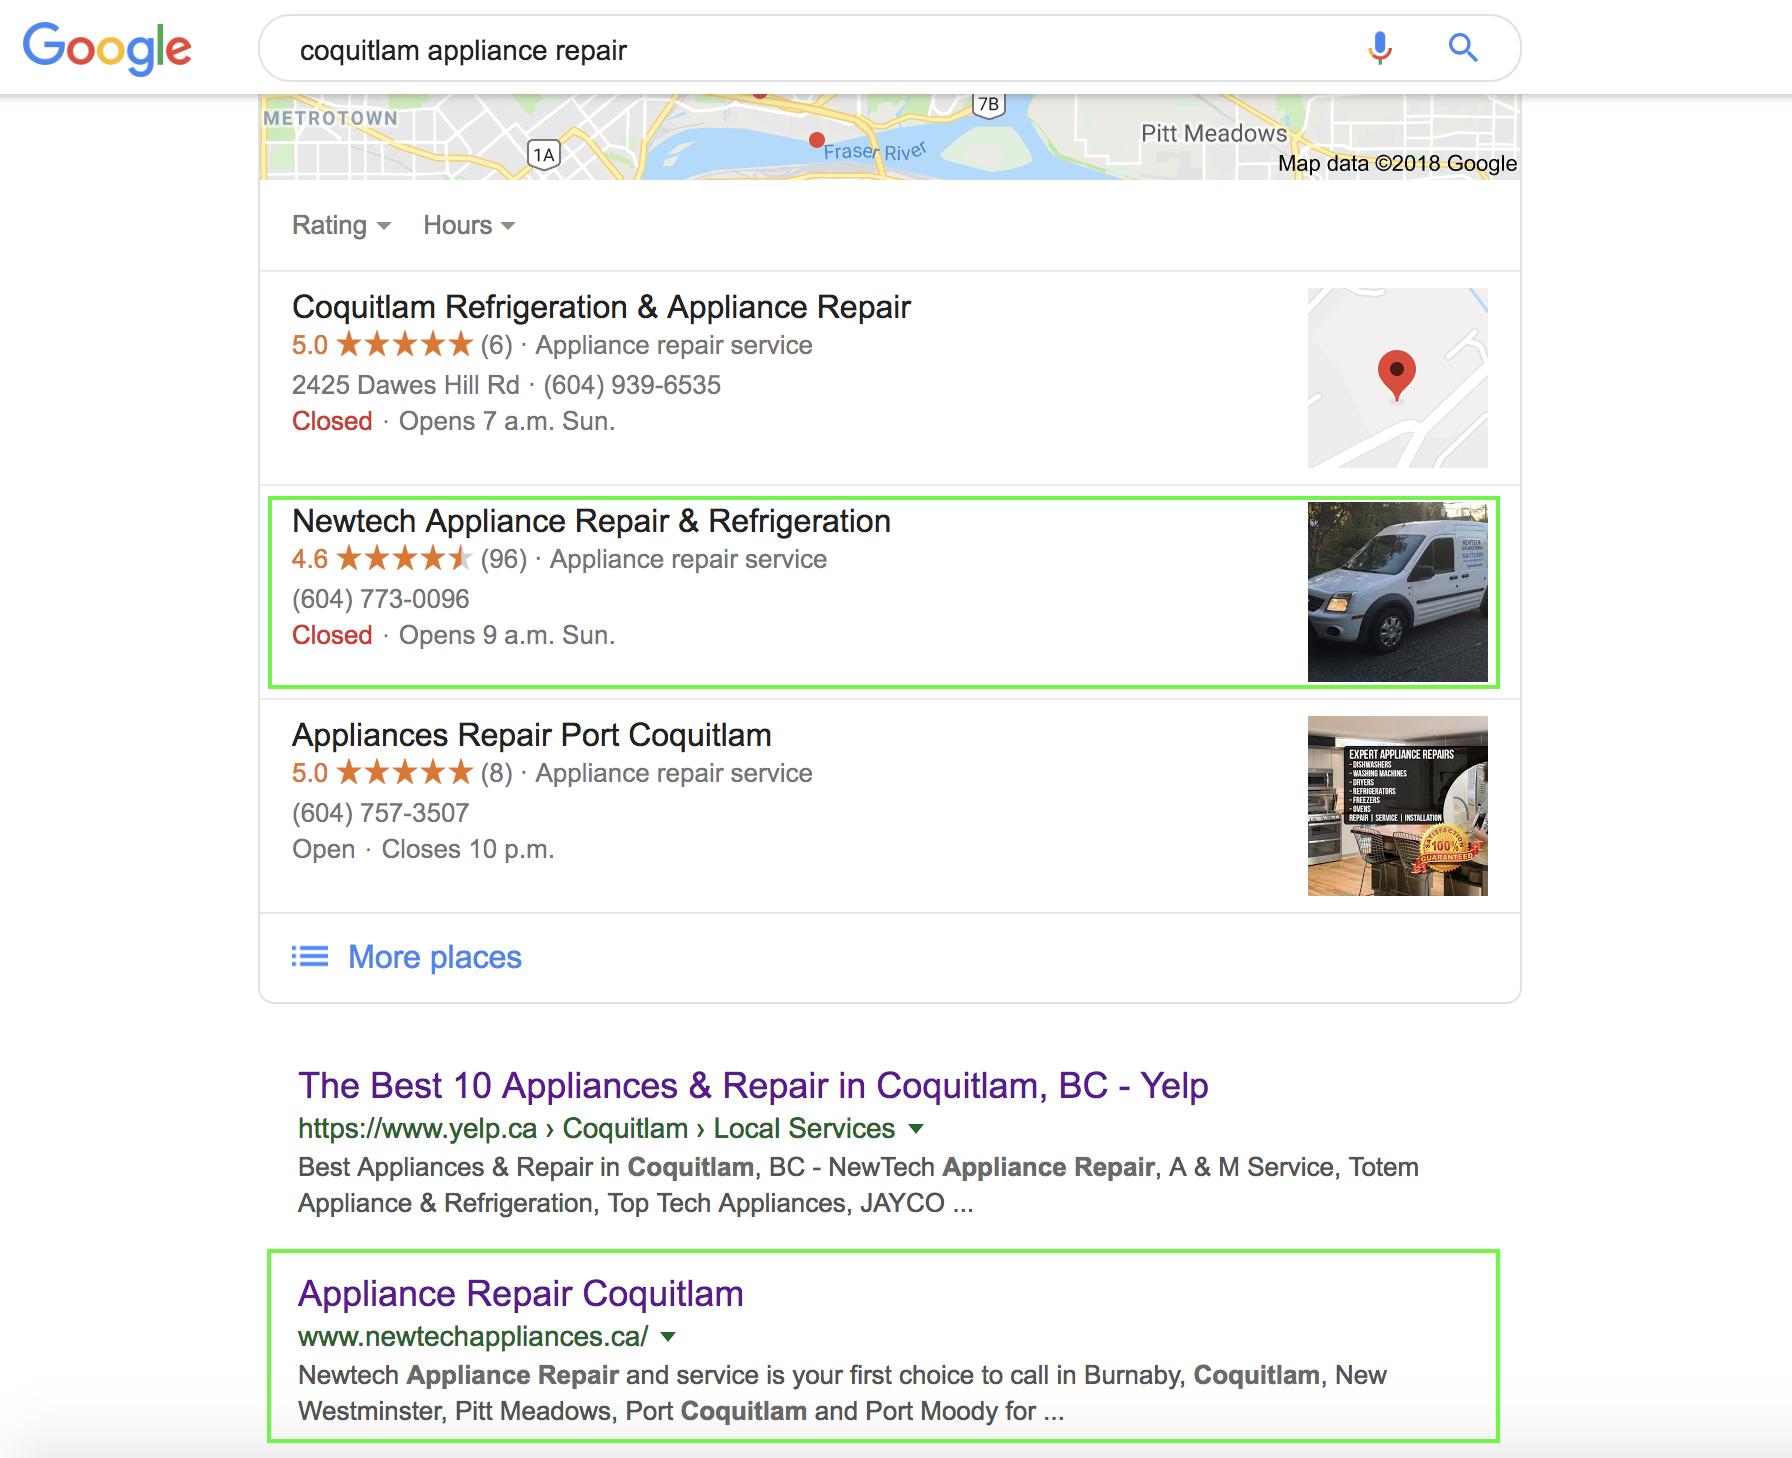 seo edmonton client results screenshot